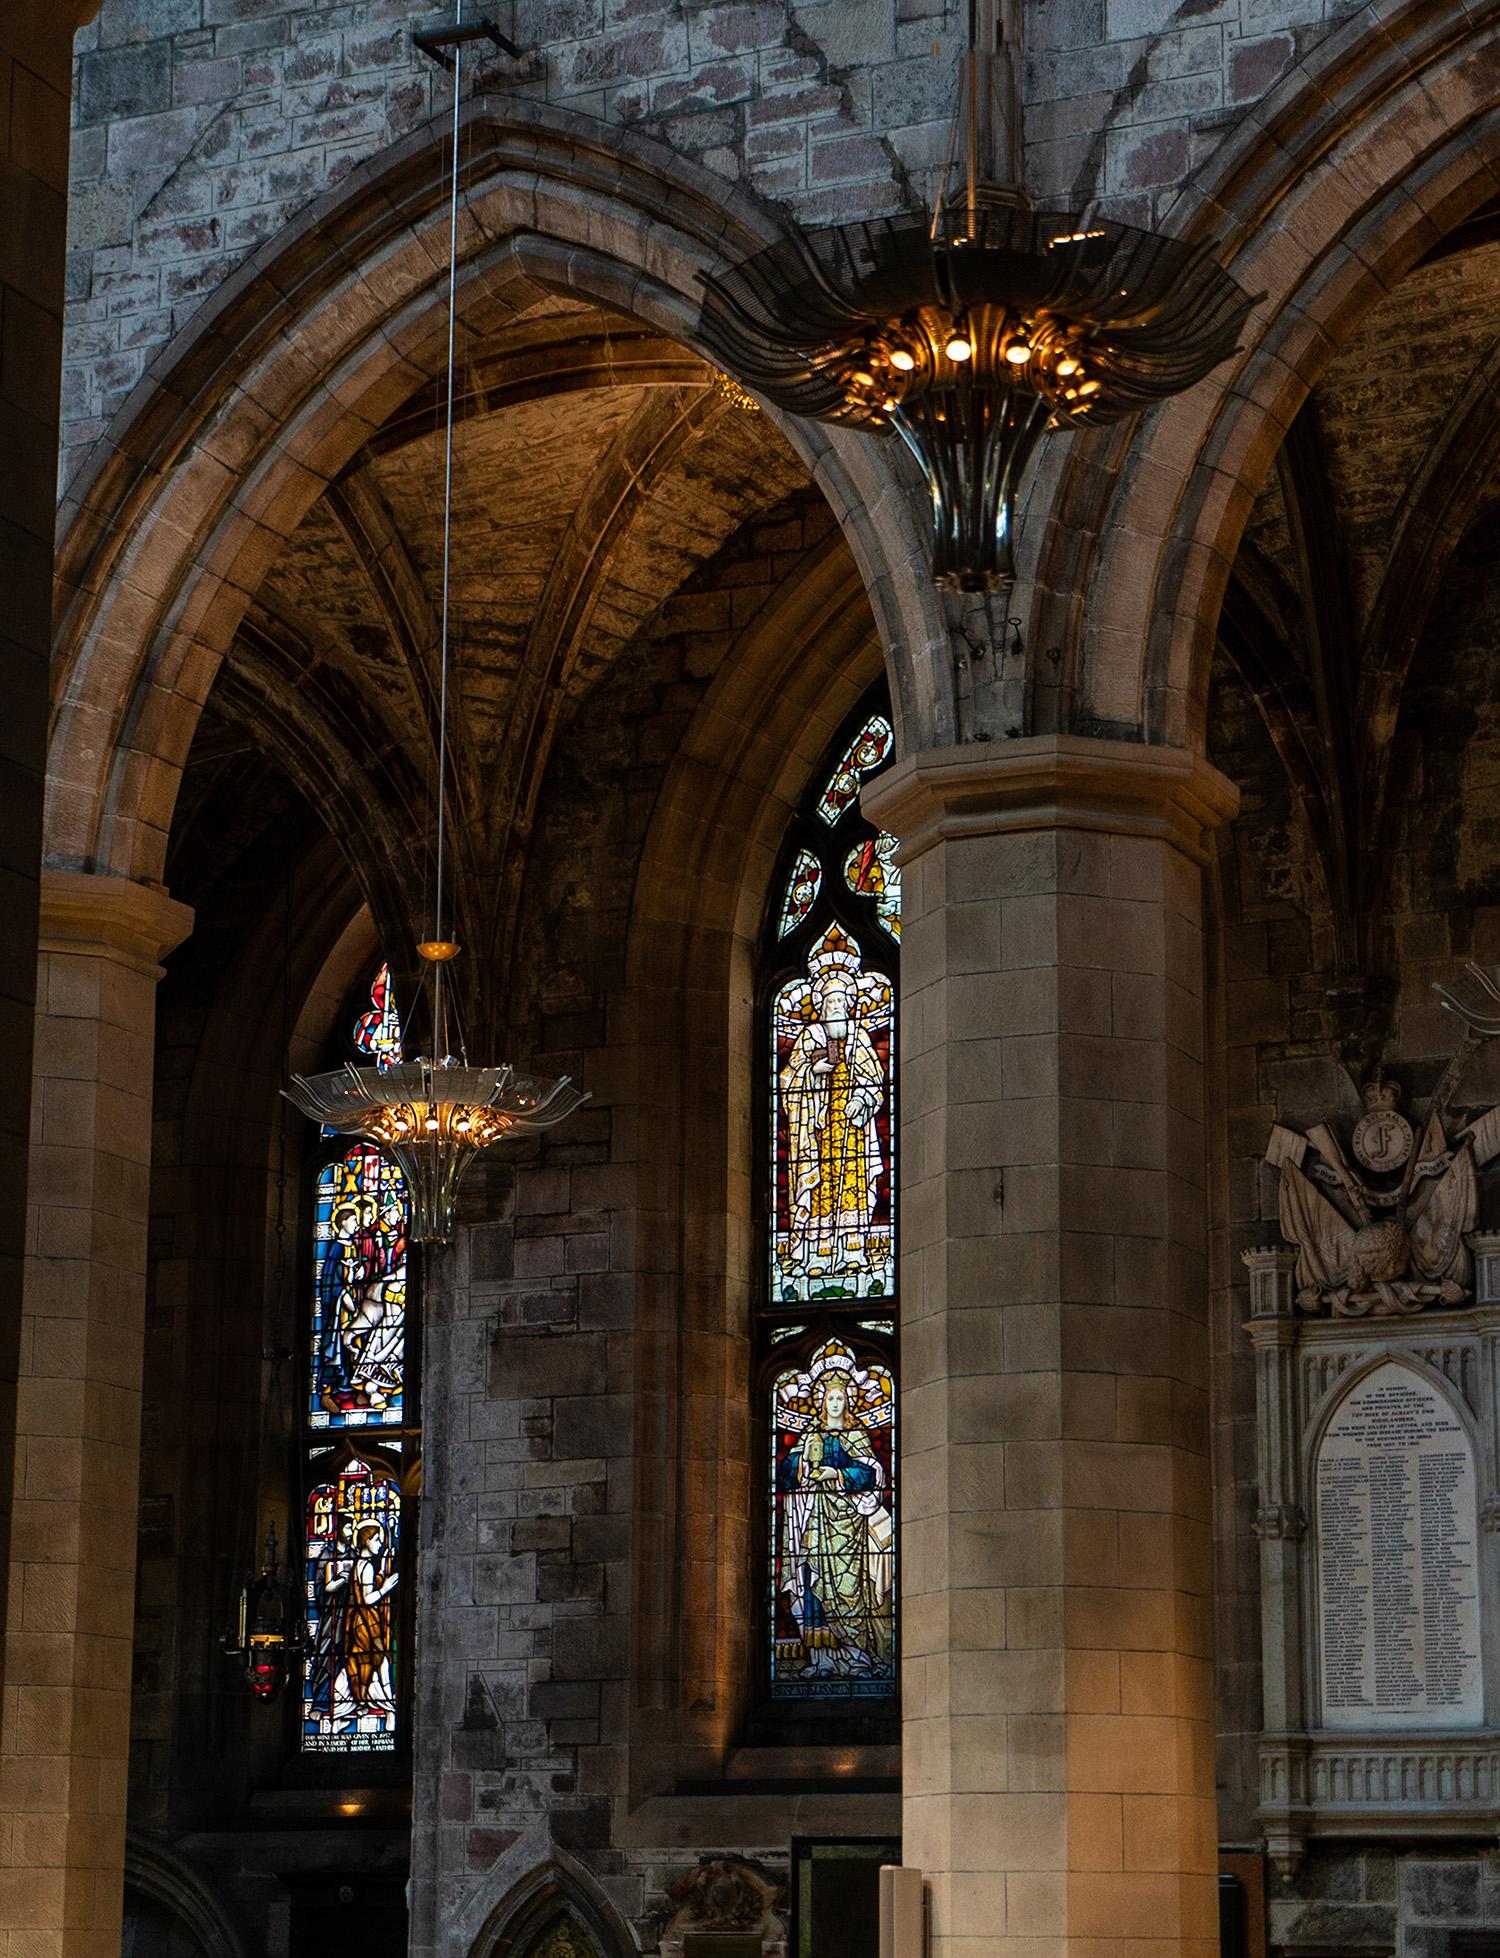 #architecture, #church, #cathedral, #scotland, #stainedglass, #presbyterian